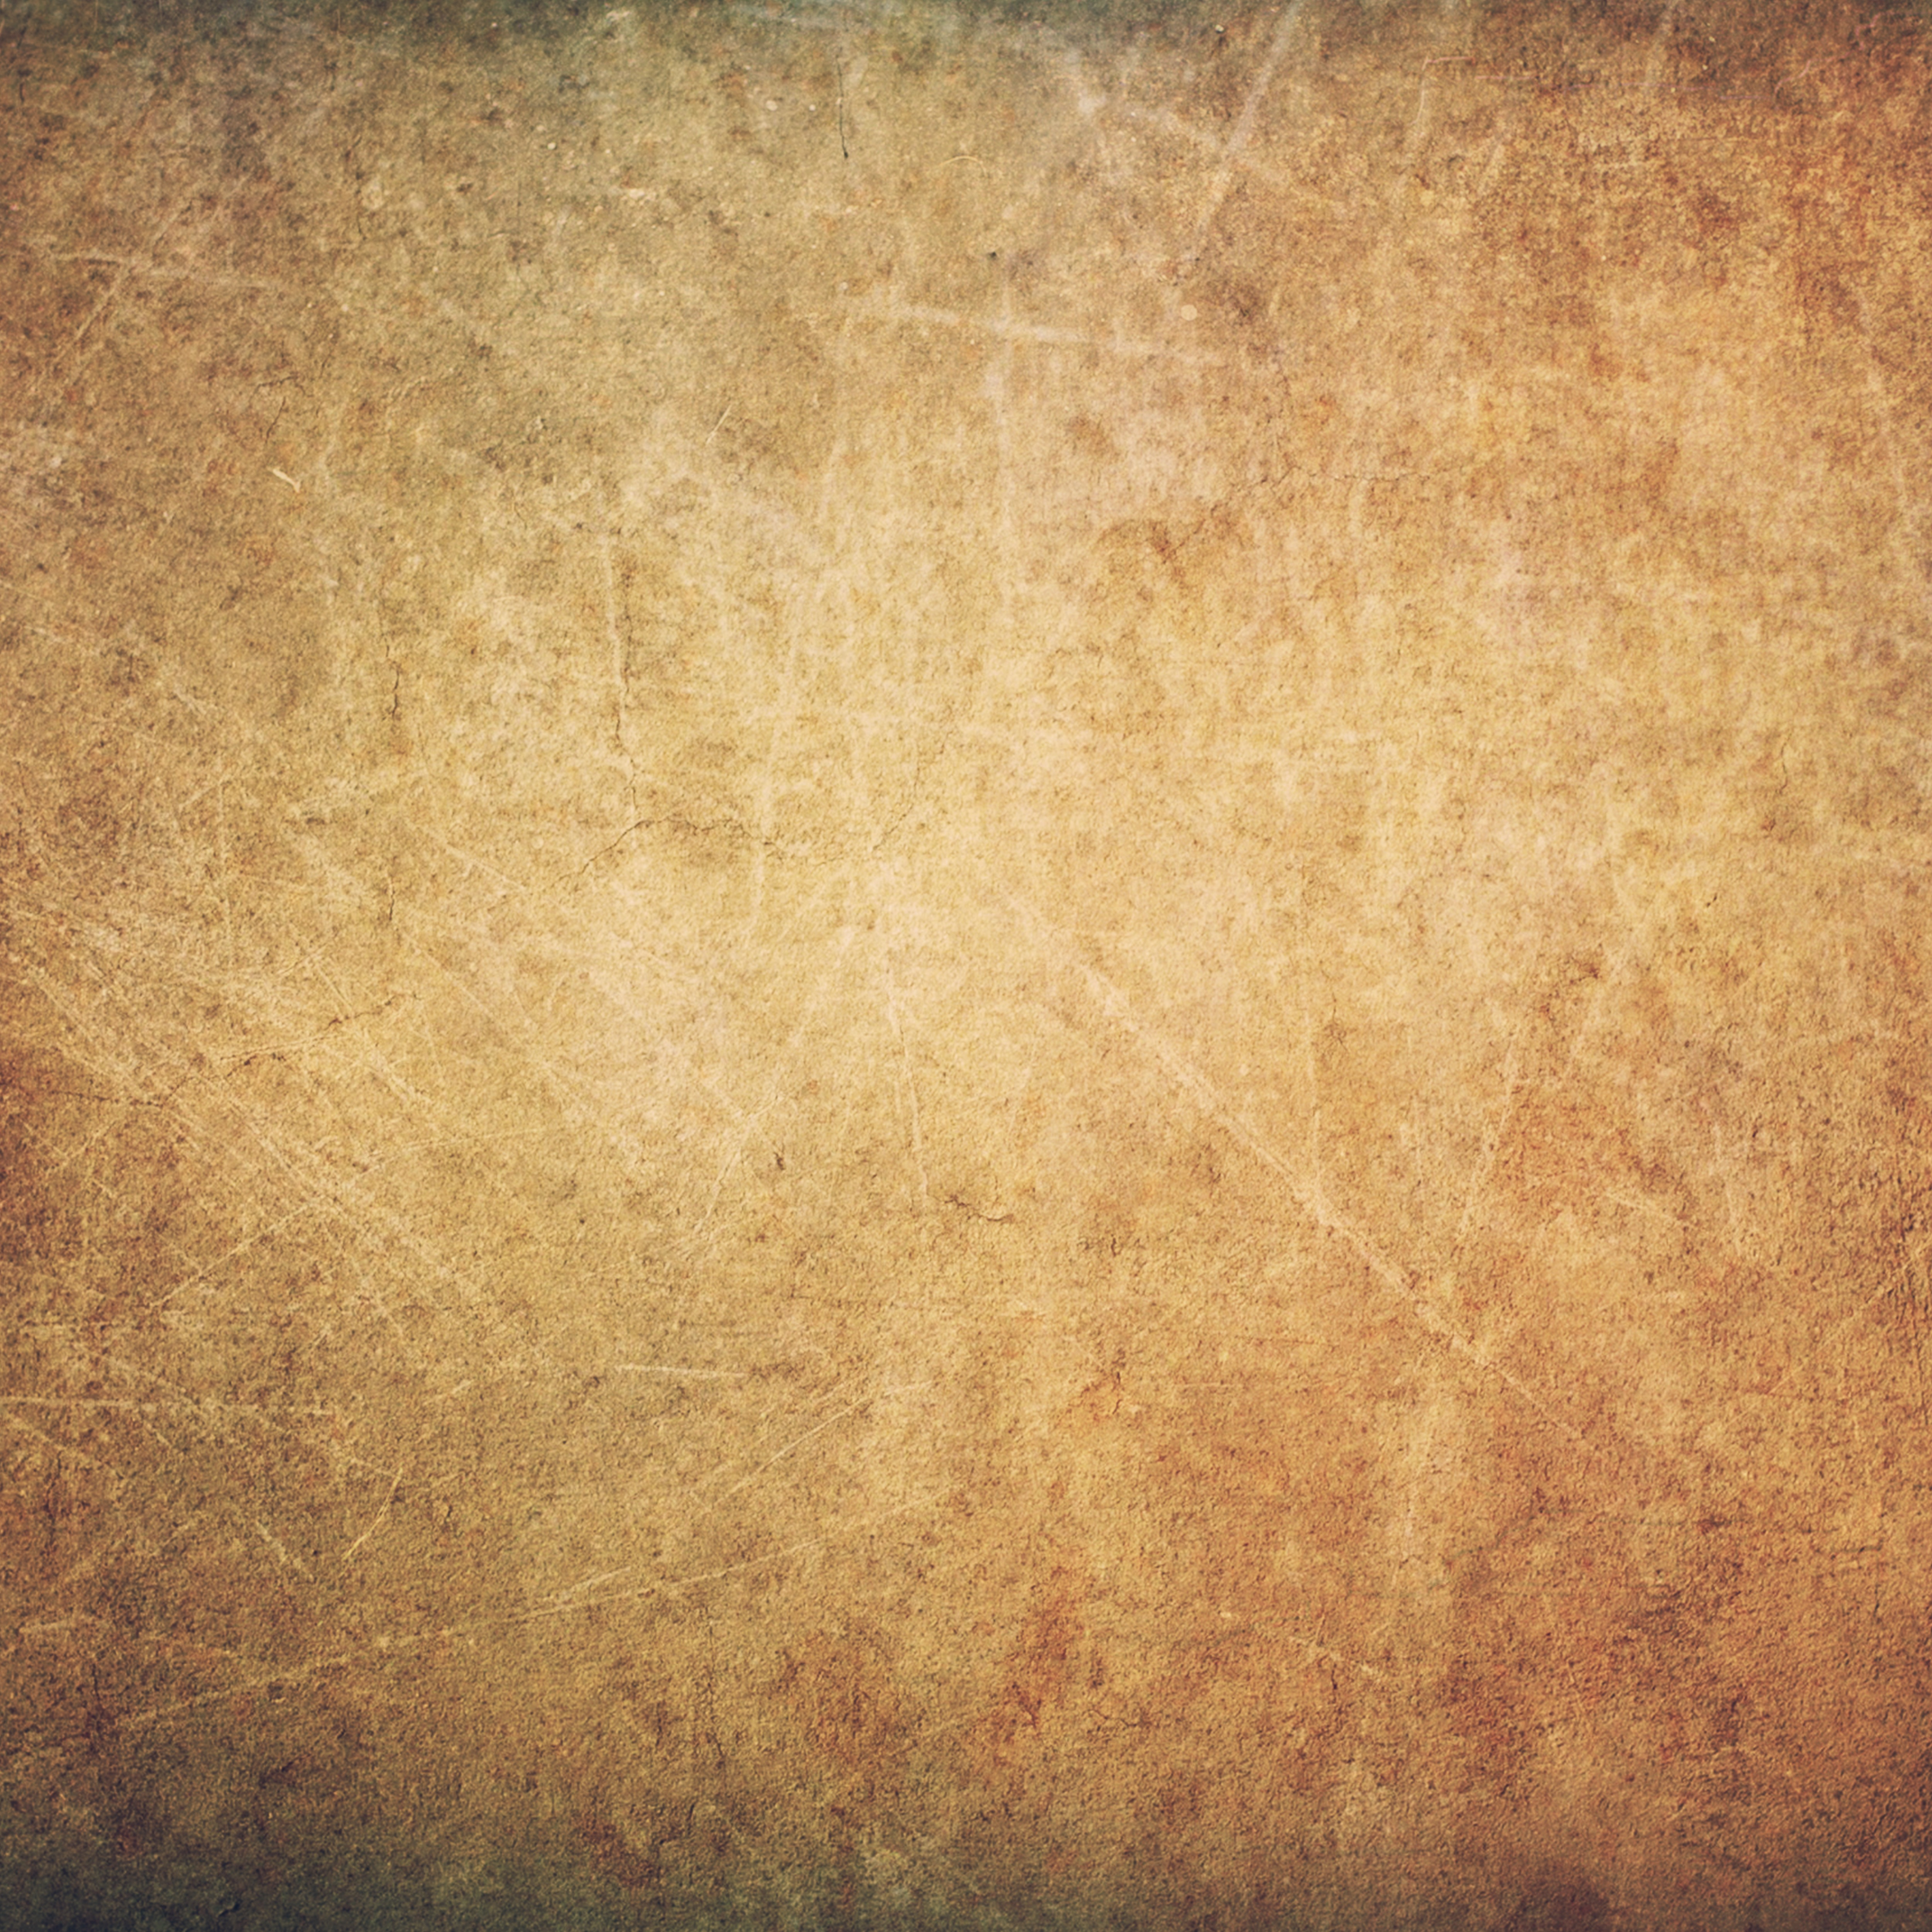 blending mode tutorial  u2013 combining a texture and image